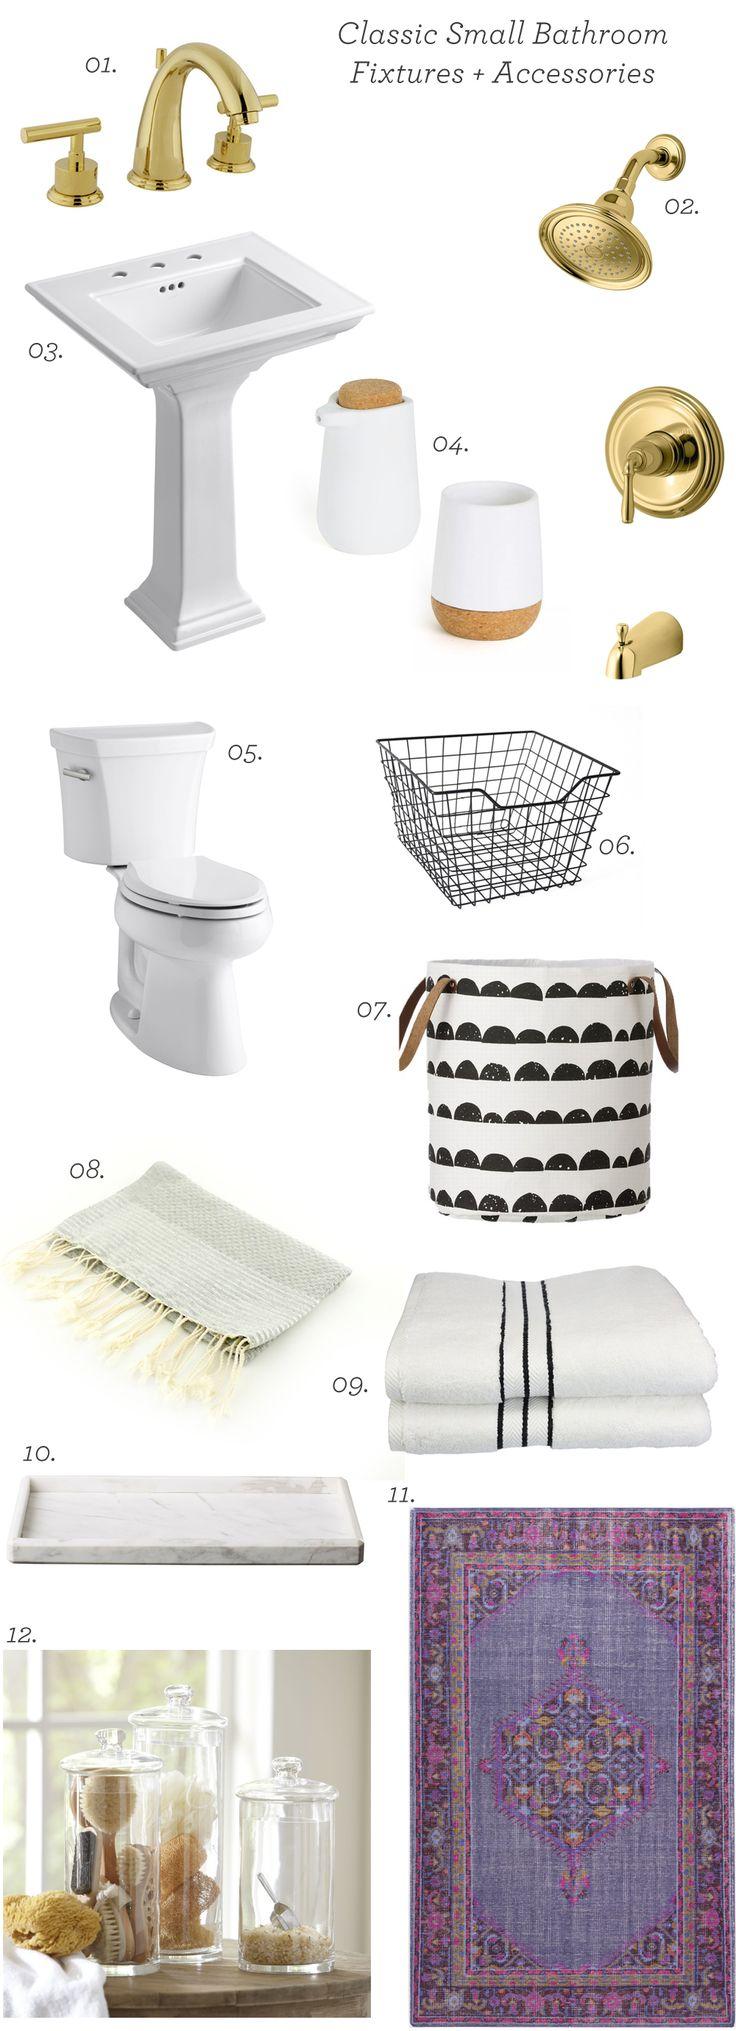 Bathroom Fixtures For Small Bathrooms best 25+ classic small bathrooms ideas on pinterest | small grey